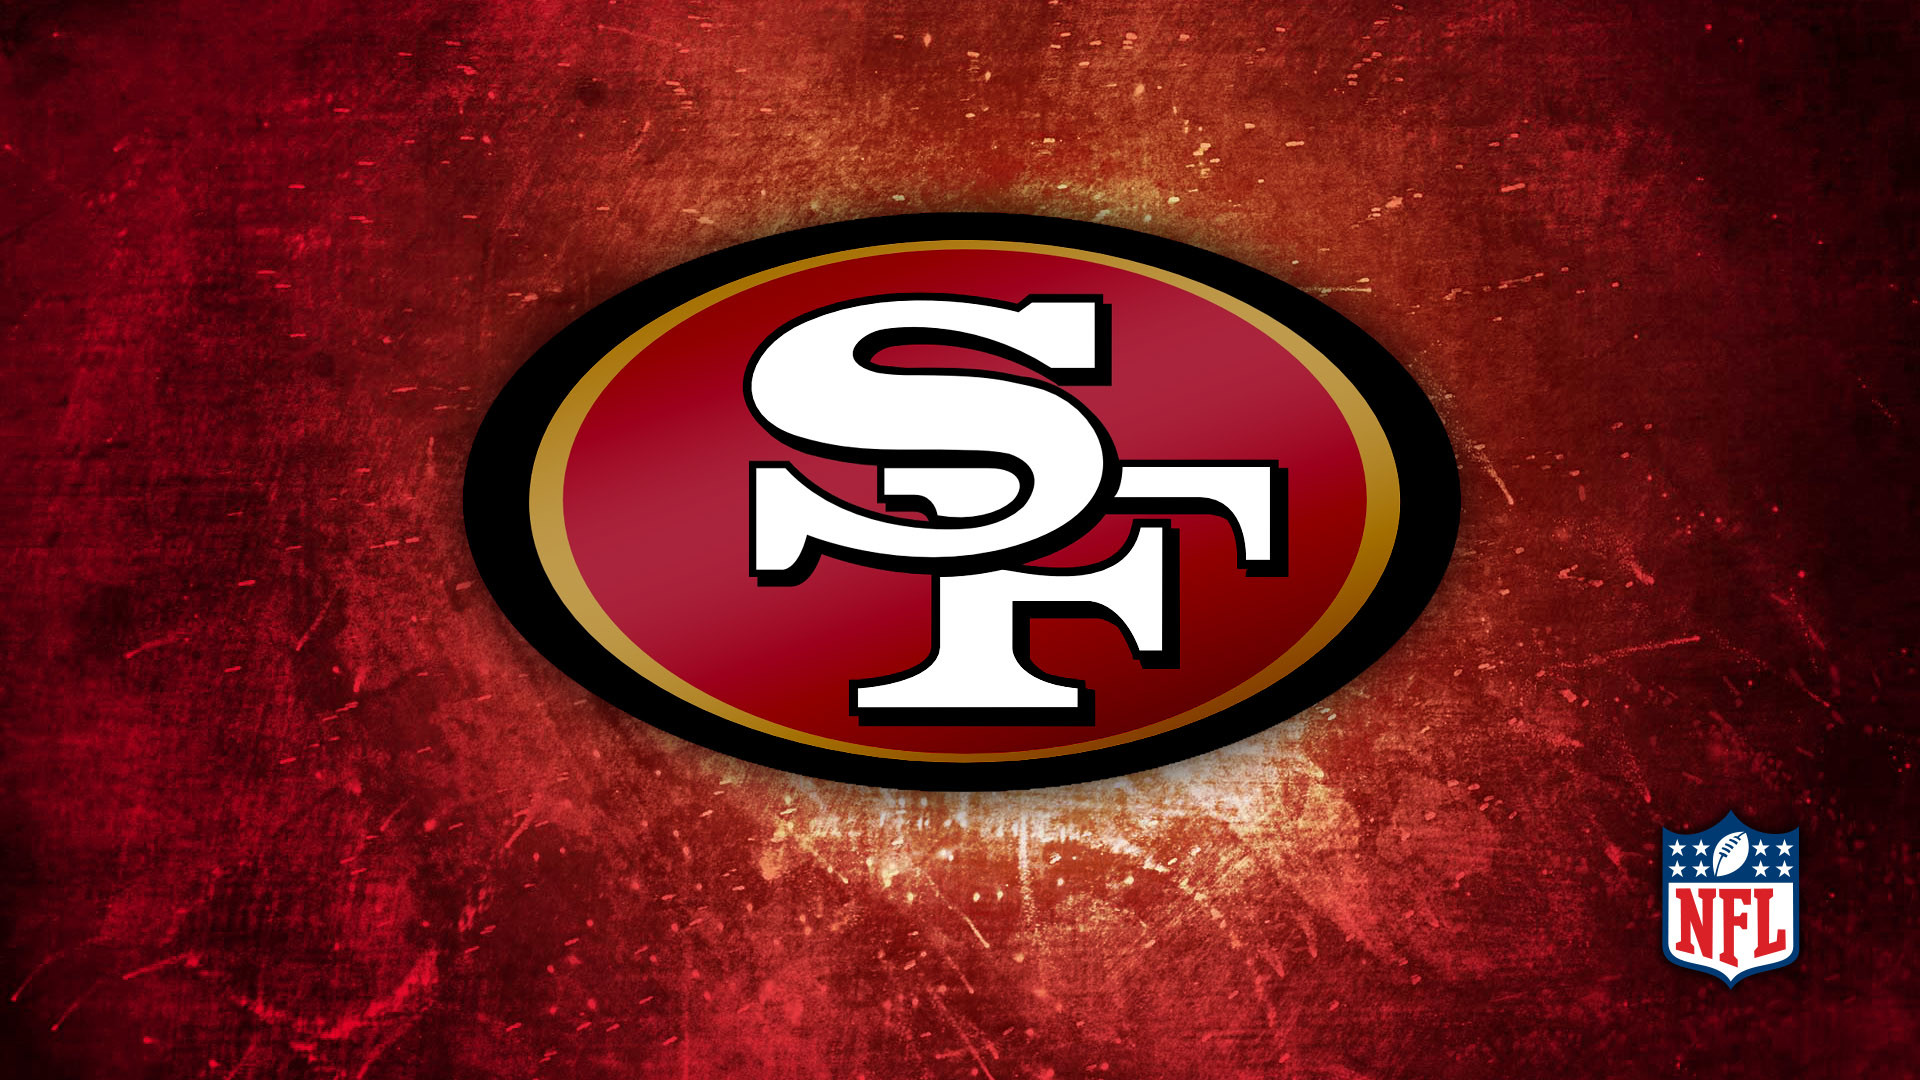 San Francisco 49ers 10 Best Wallpaper | San Francisco 49ers. Equipo de  Fútbol Americano. | Pinterest | San francisco 49ers